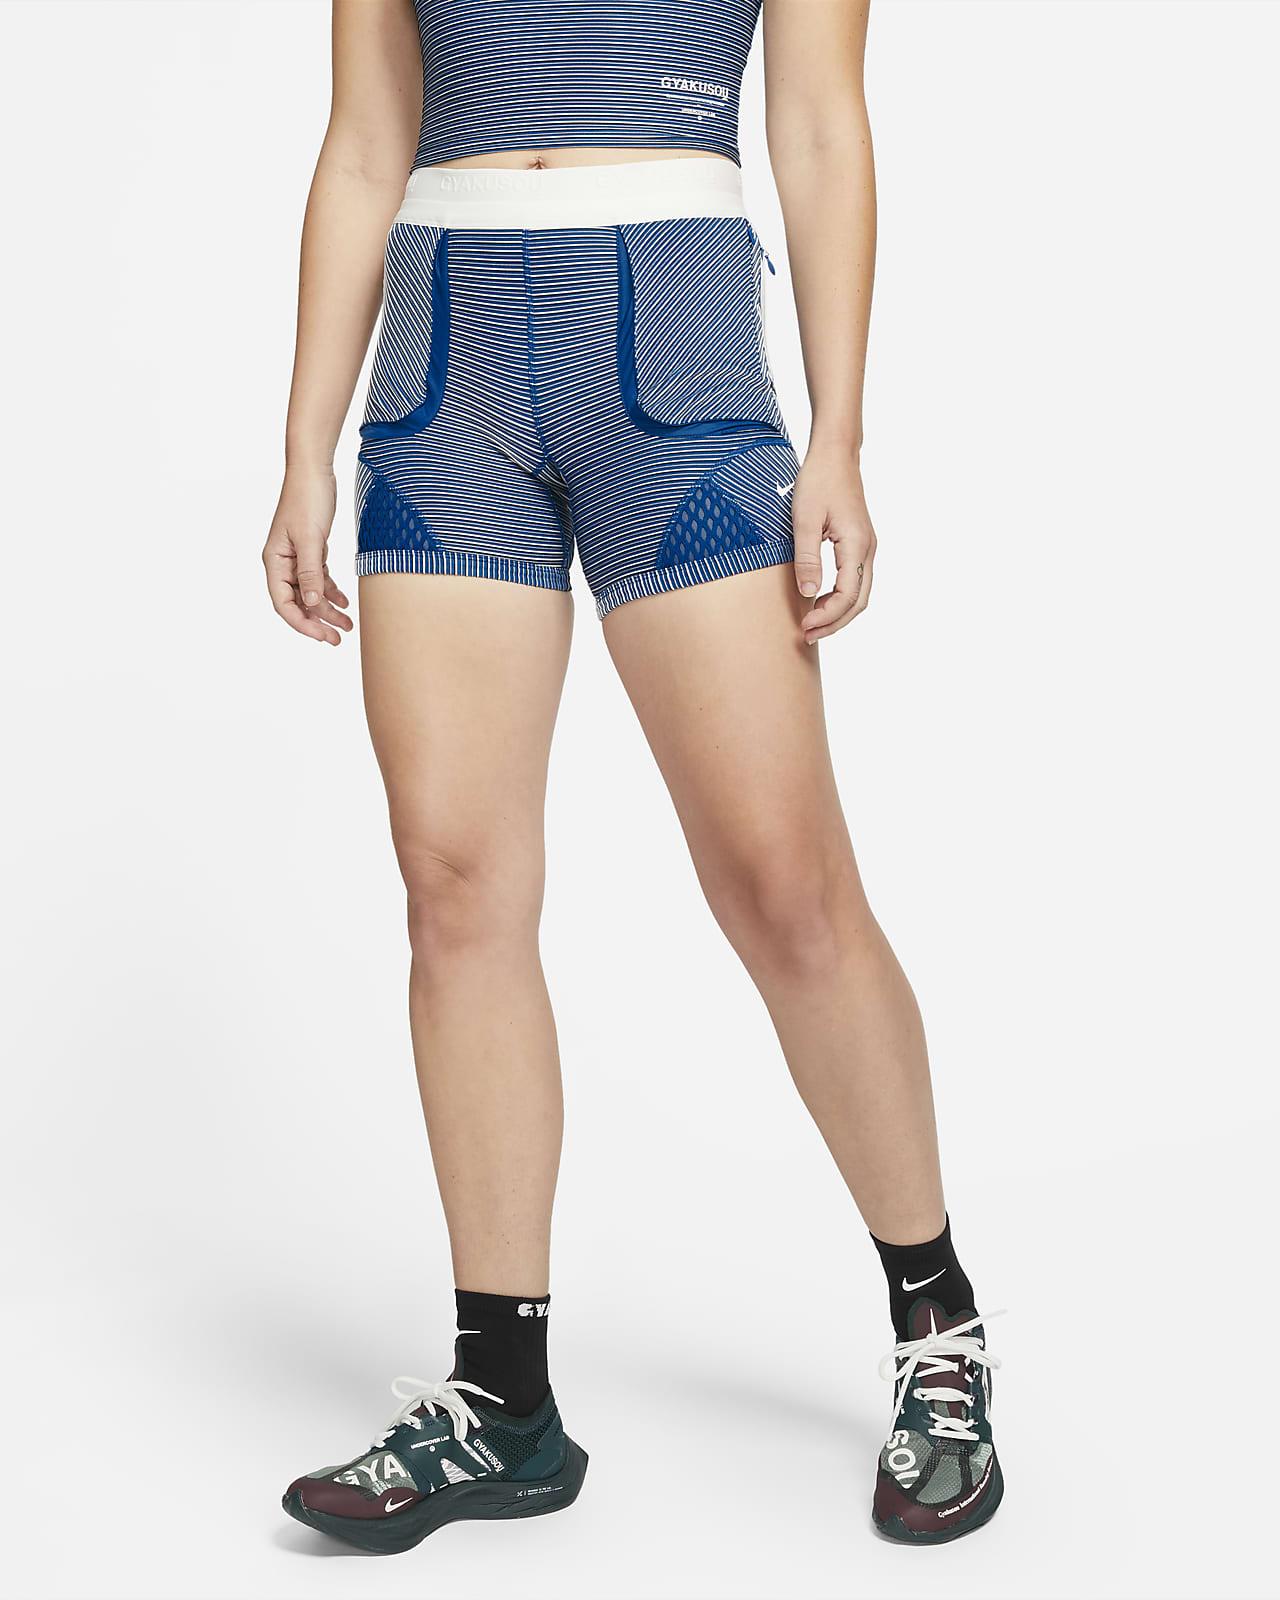 Nike x Gyakusou Praktische damesshorts